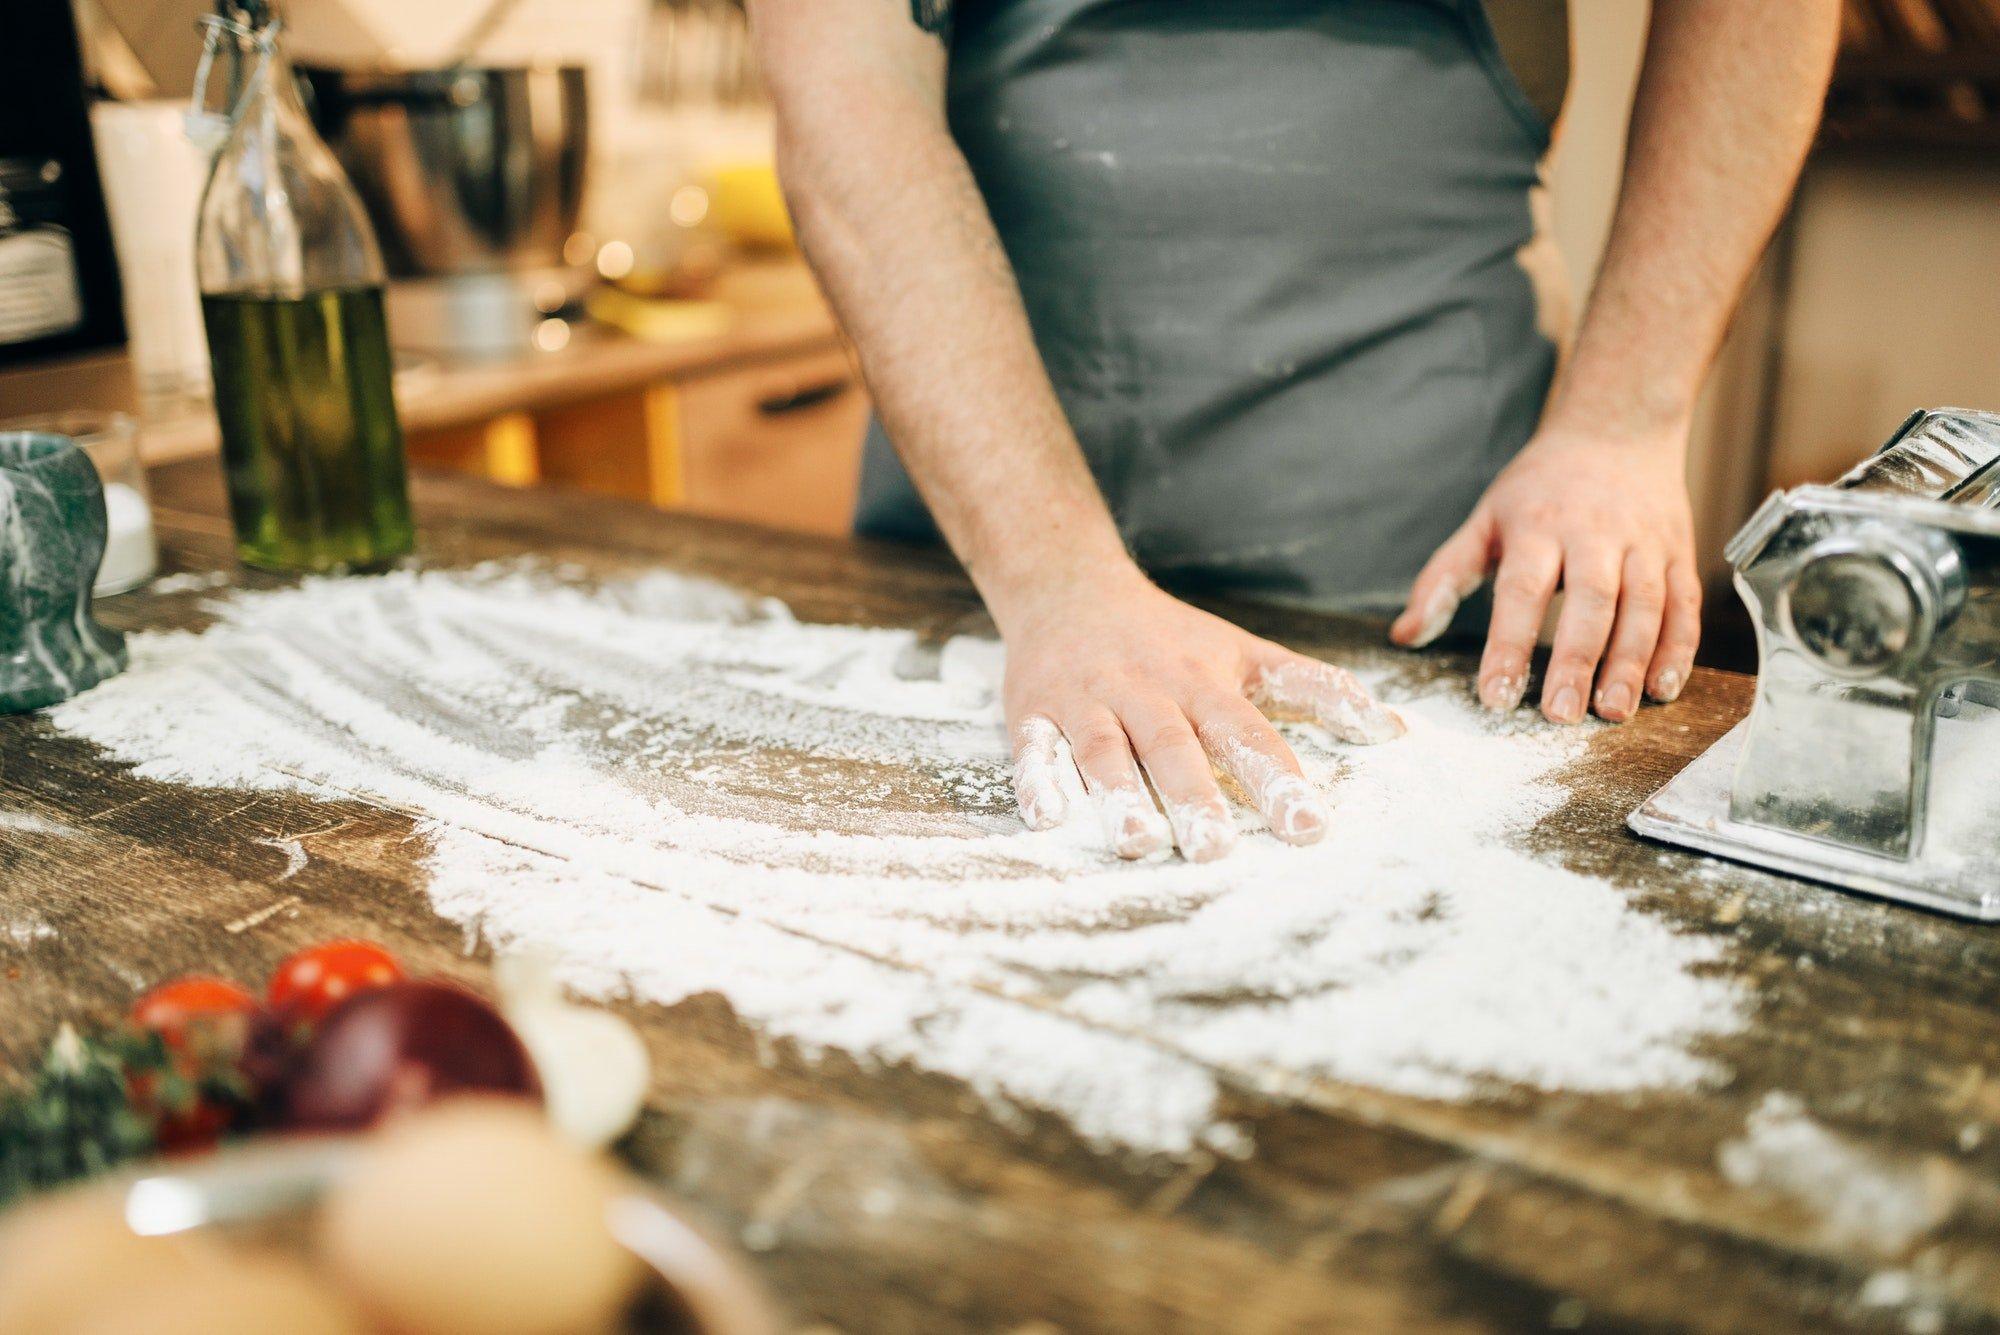 Chef in apron, flour,eggs, pasta machine on table